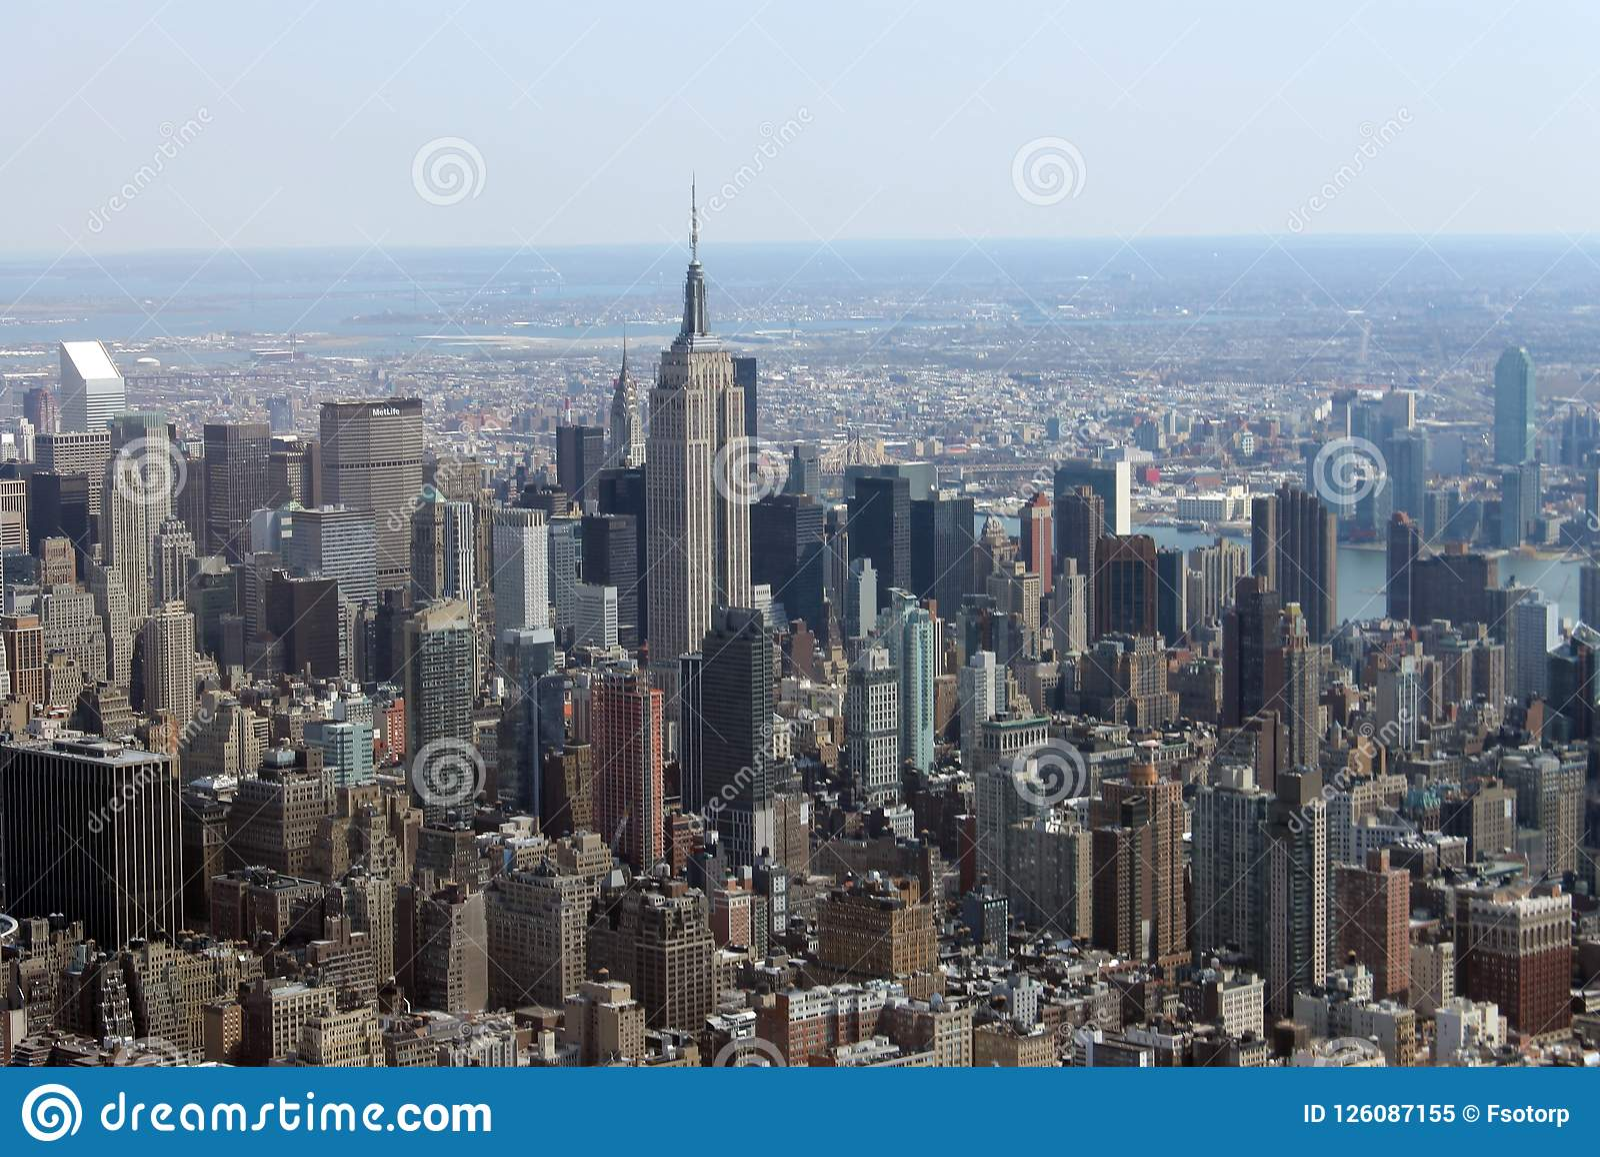 New York City Skyline Rockefeller Center Helicopter Editorial Image